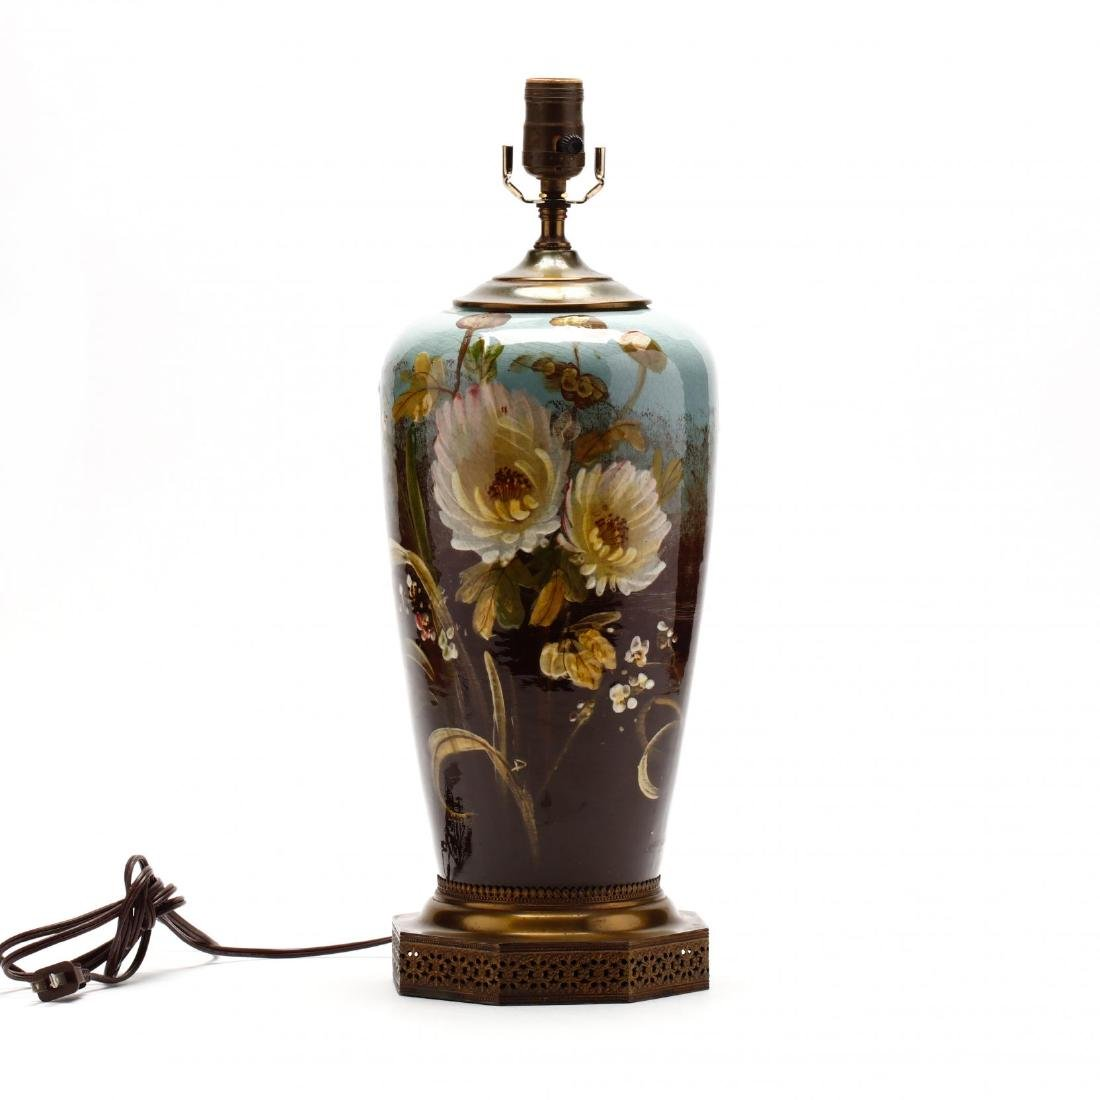 Vintage Art Pottery Lamp